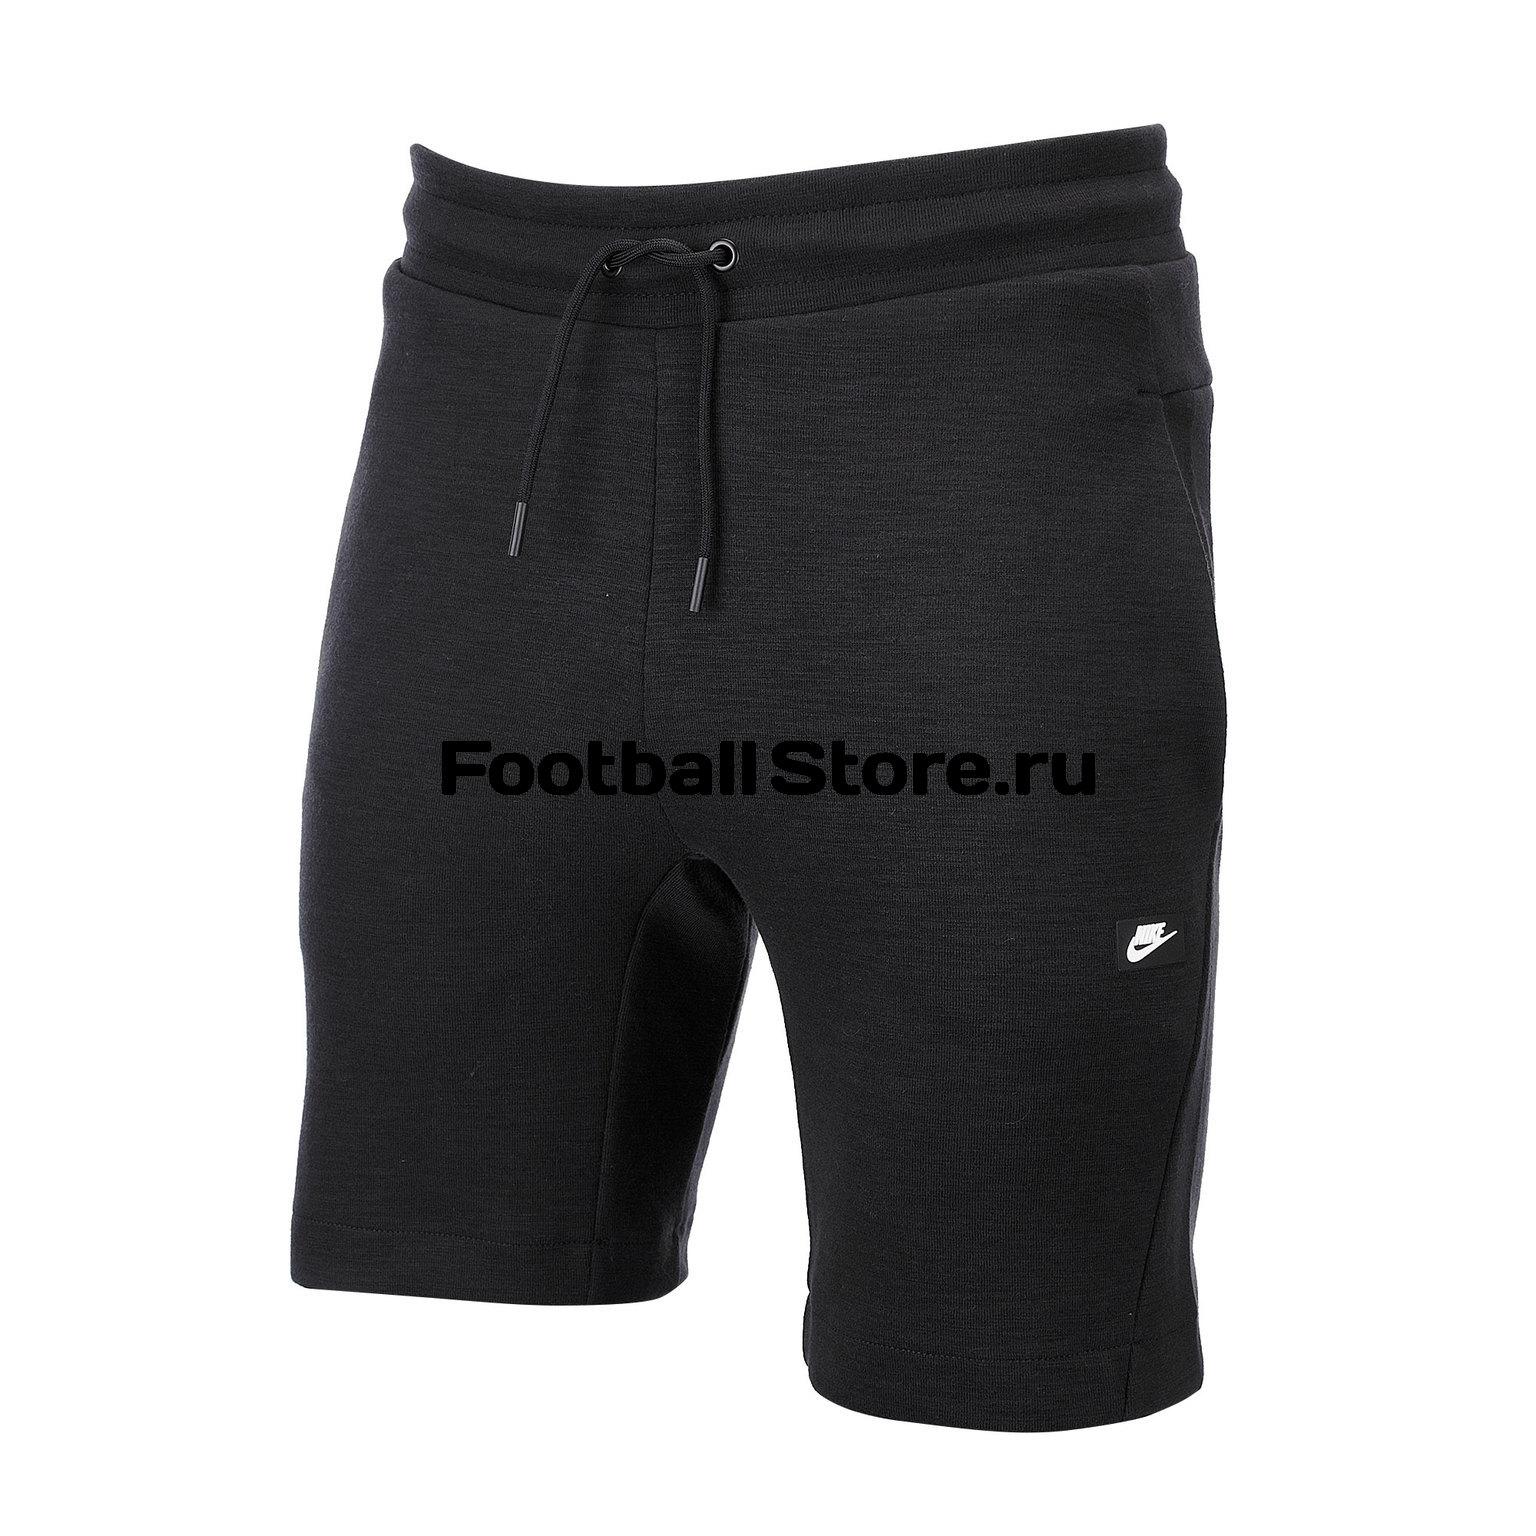 Шорты Nike Optic Short 928509-011